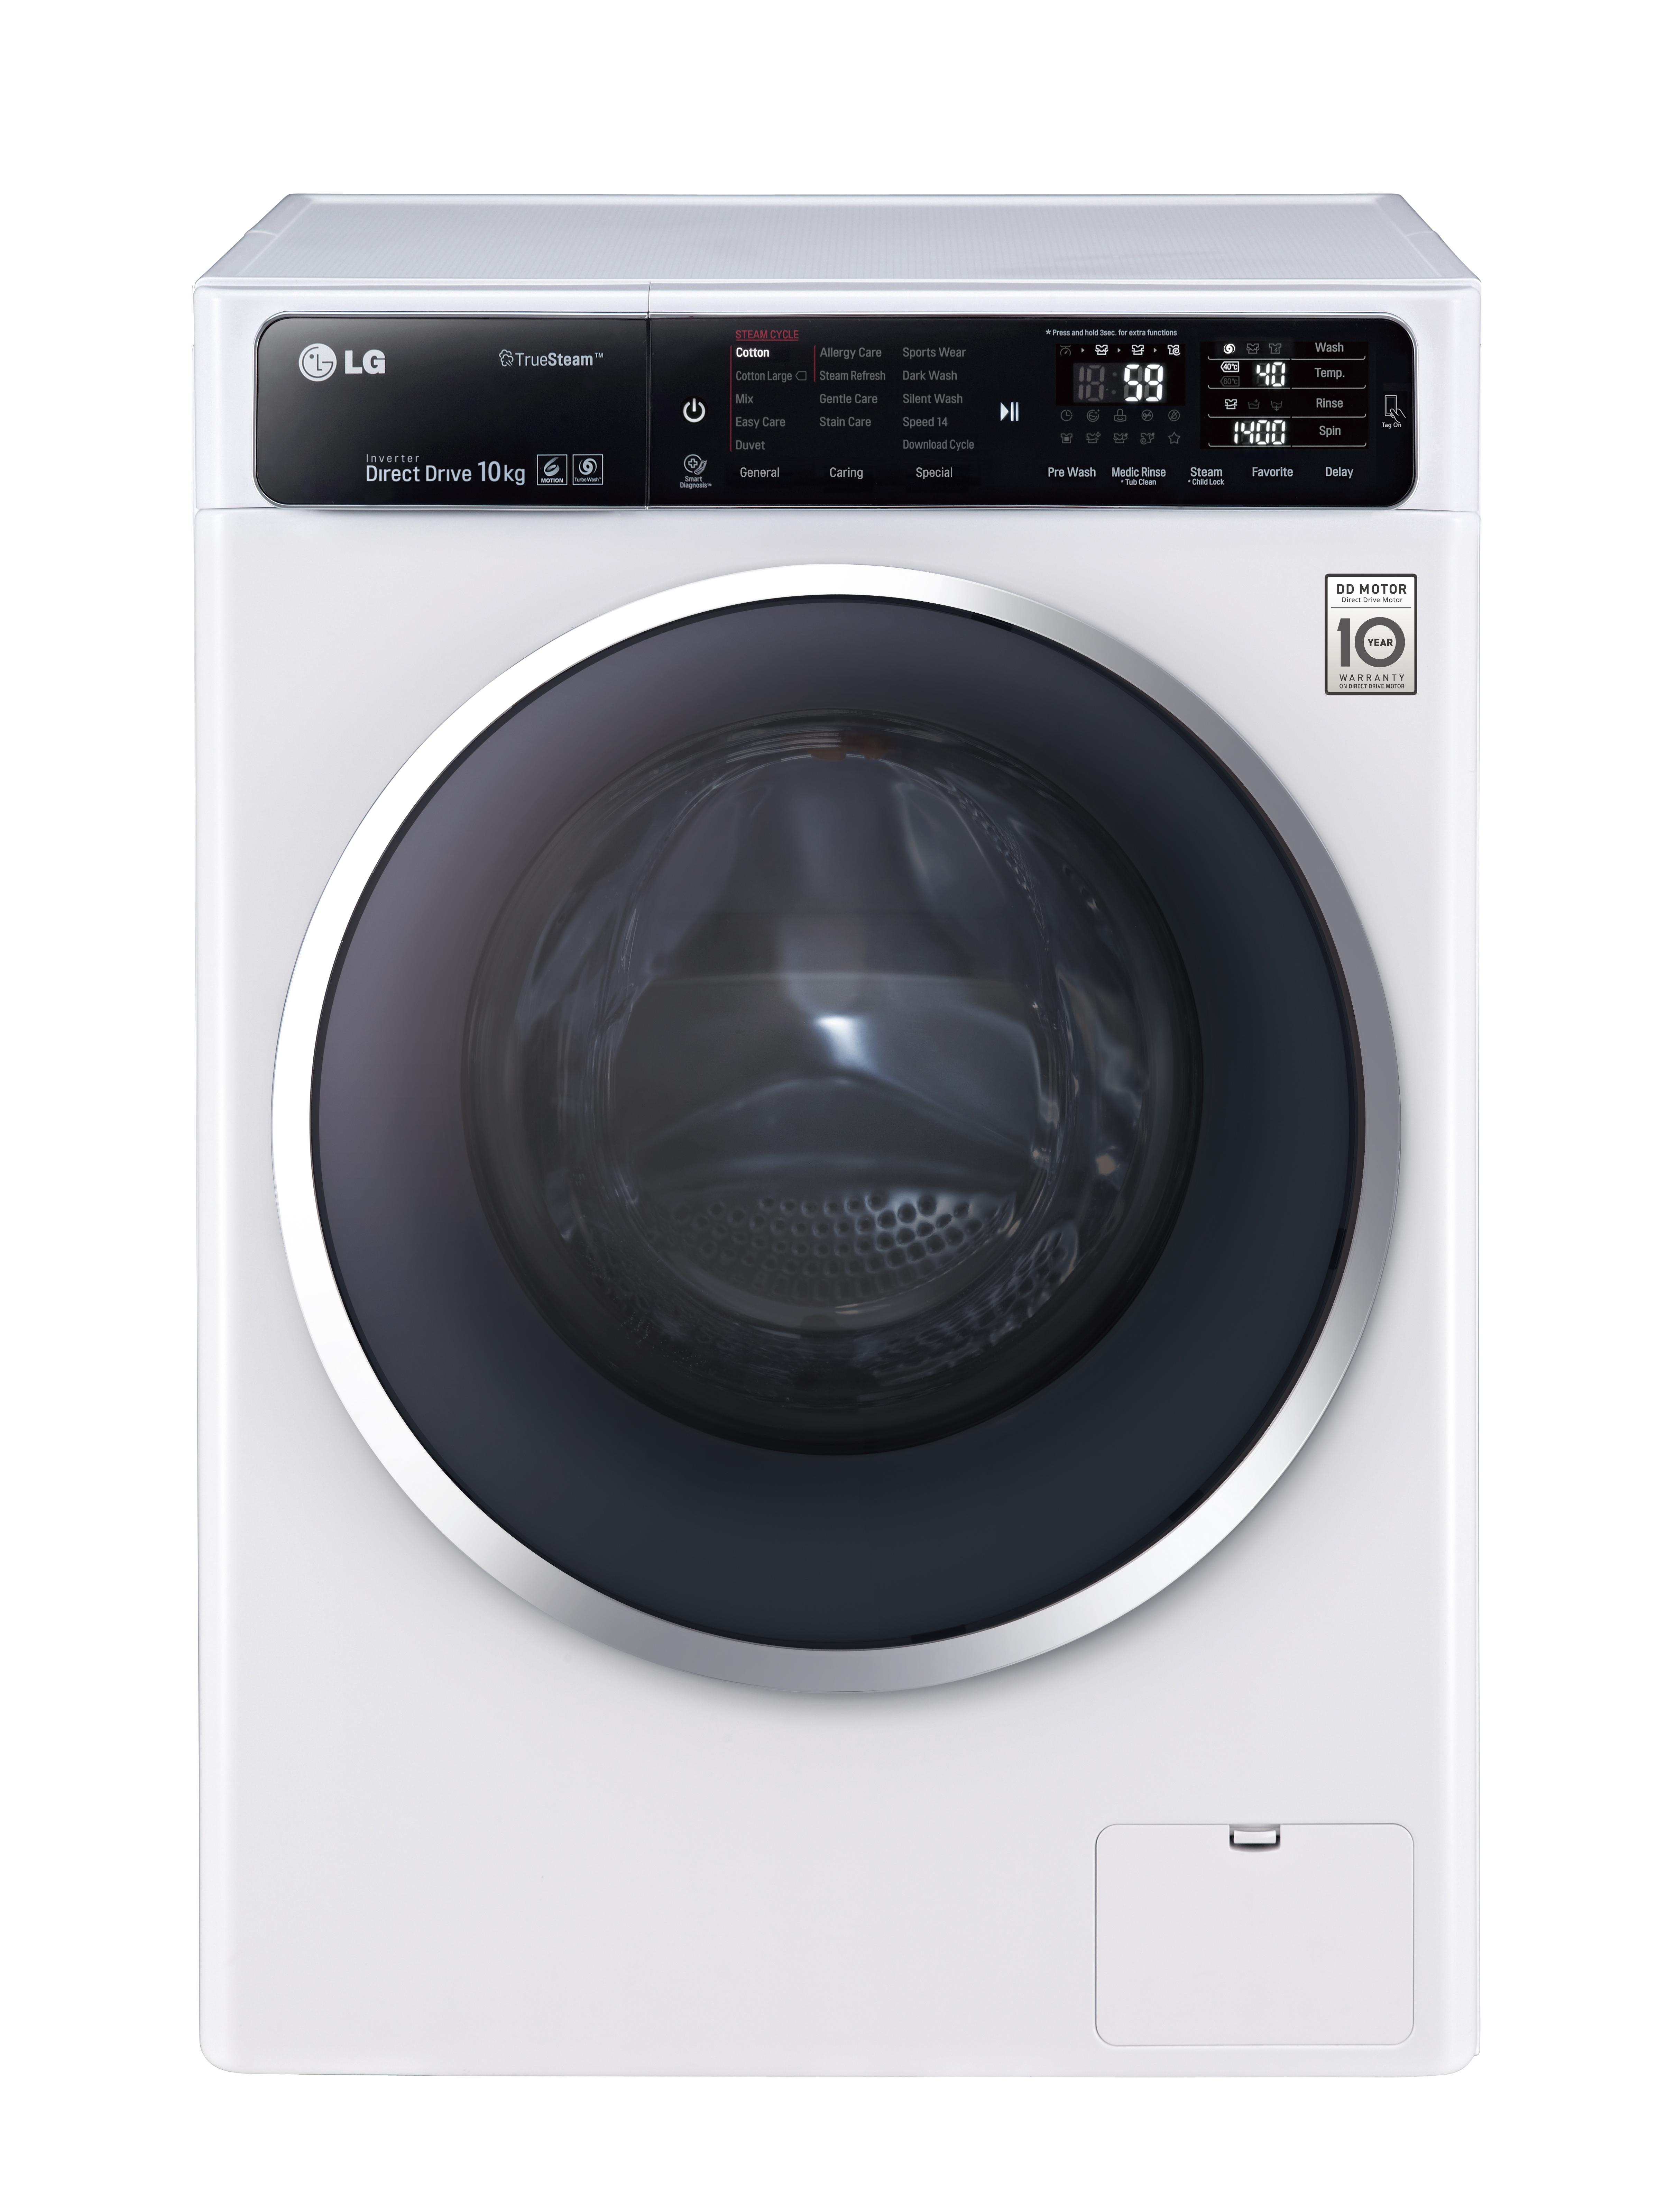 Lgs latest washing machines prioritize time and energy savings lg front loadwashingmachineseries11g buycottarizona Images